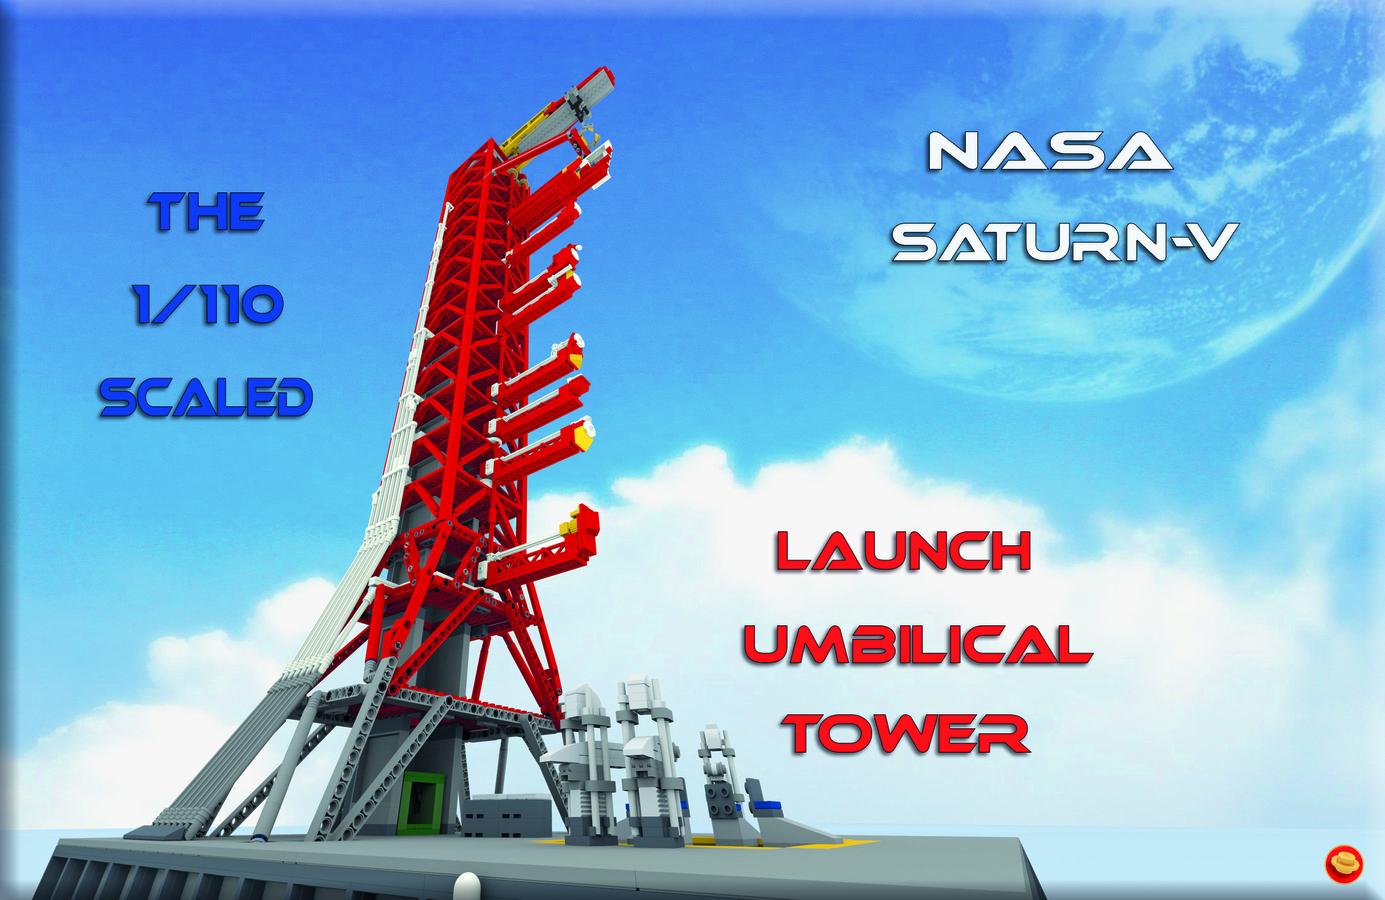 LEGO IDEAS - Product Ideas - NASA Saturn-V Launch Umbilical